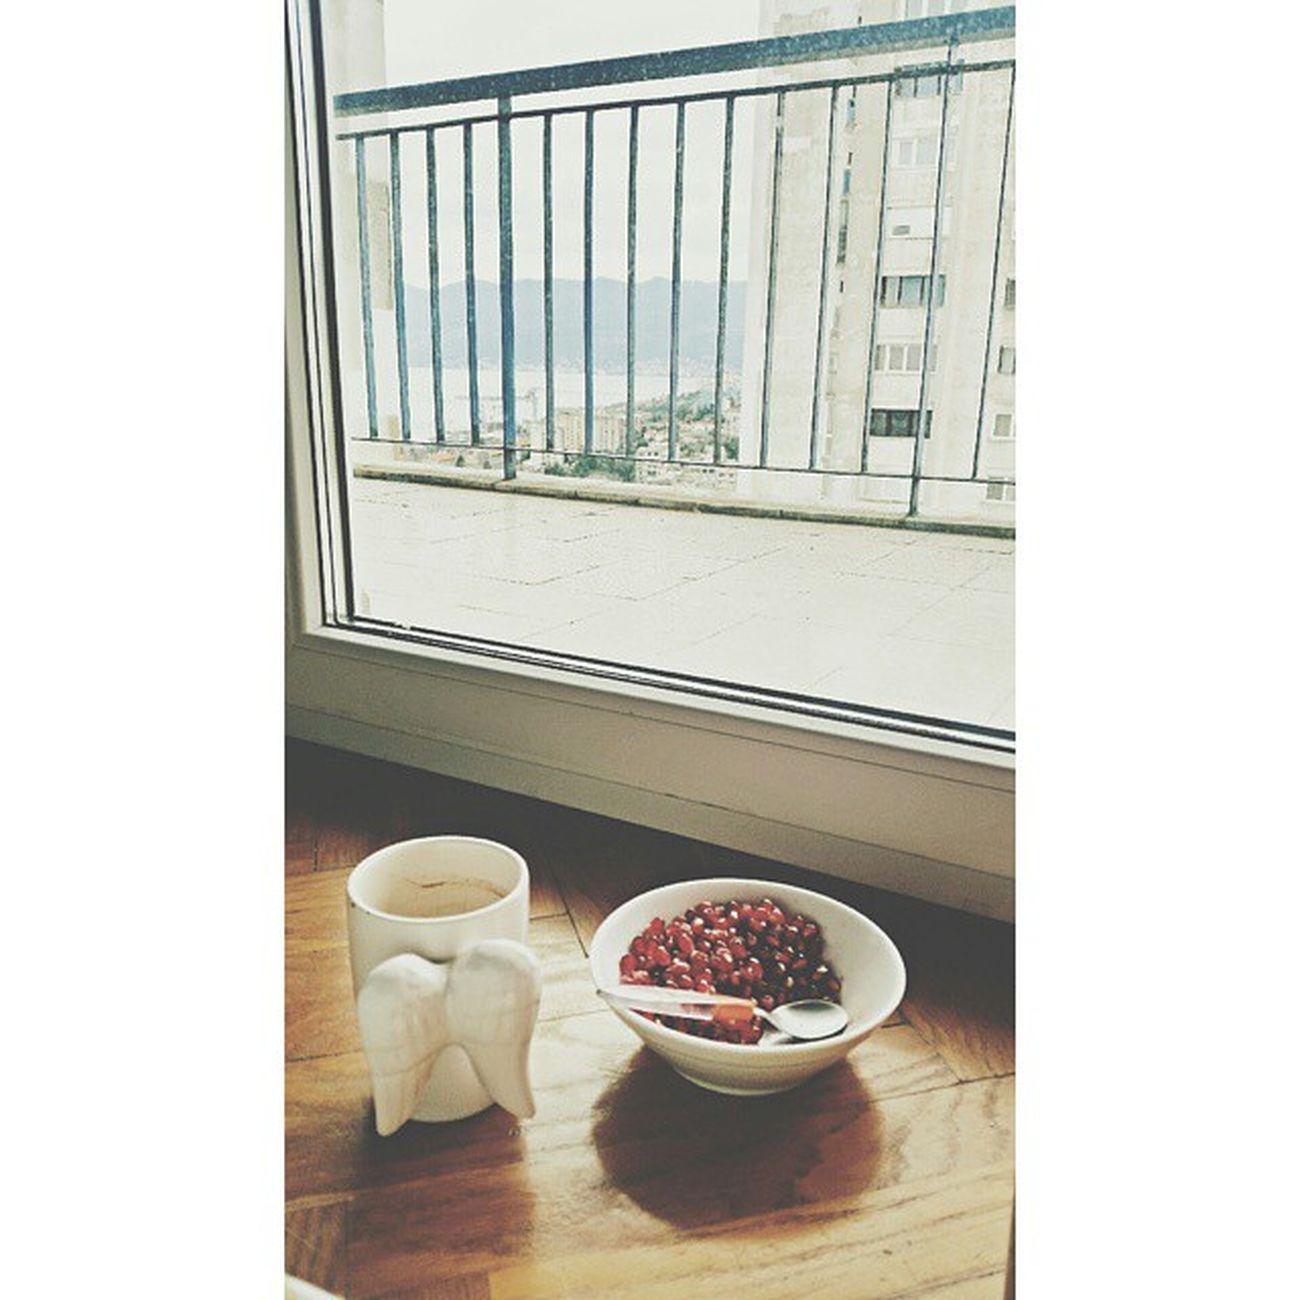 Squareinstapic Flu Sick Sea View Coffee Fruit Oporavljanje 😆